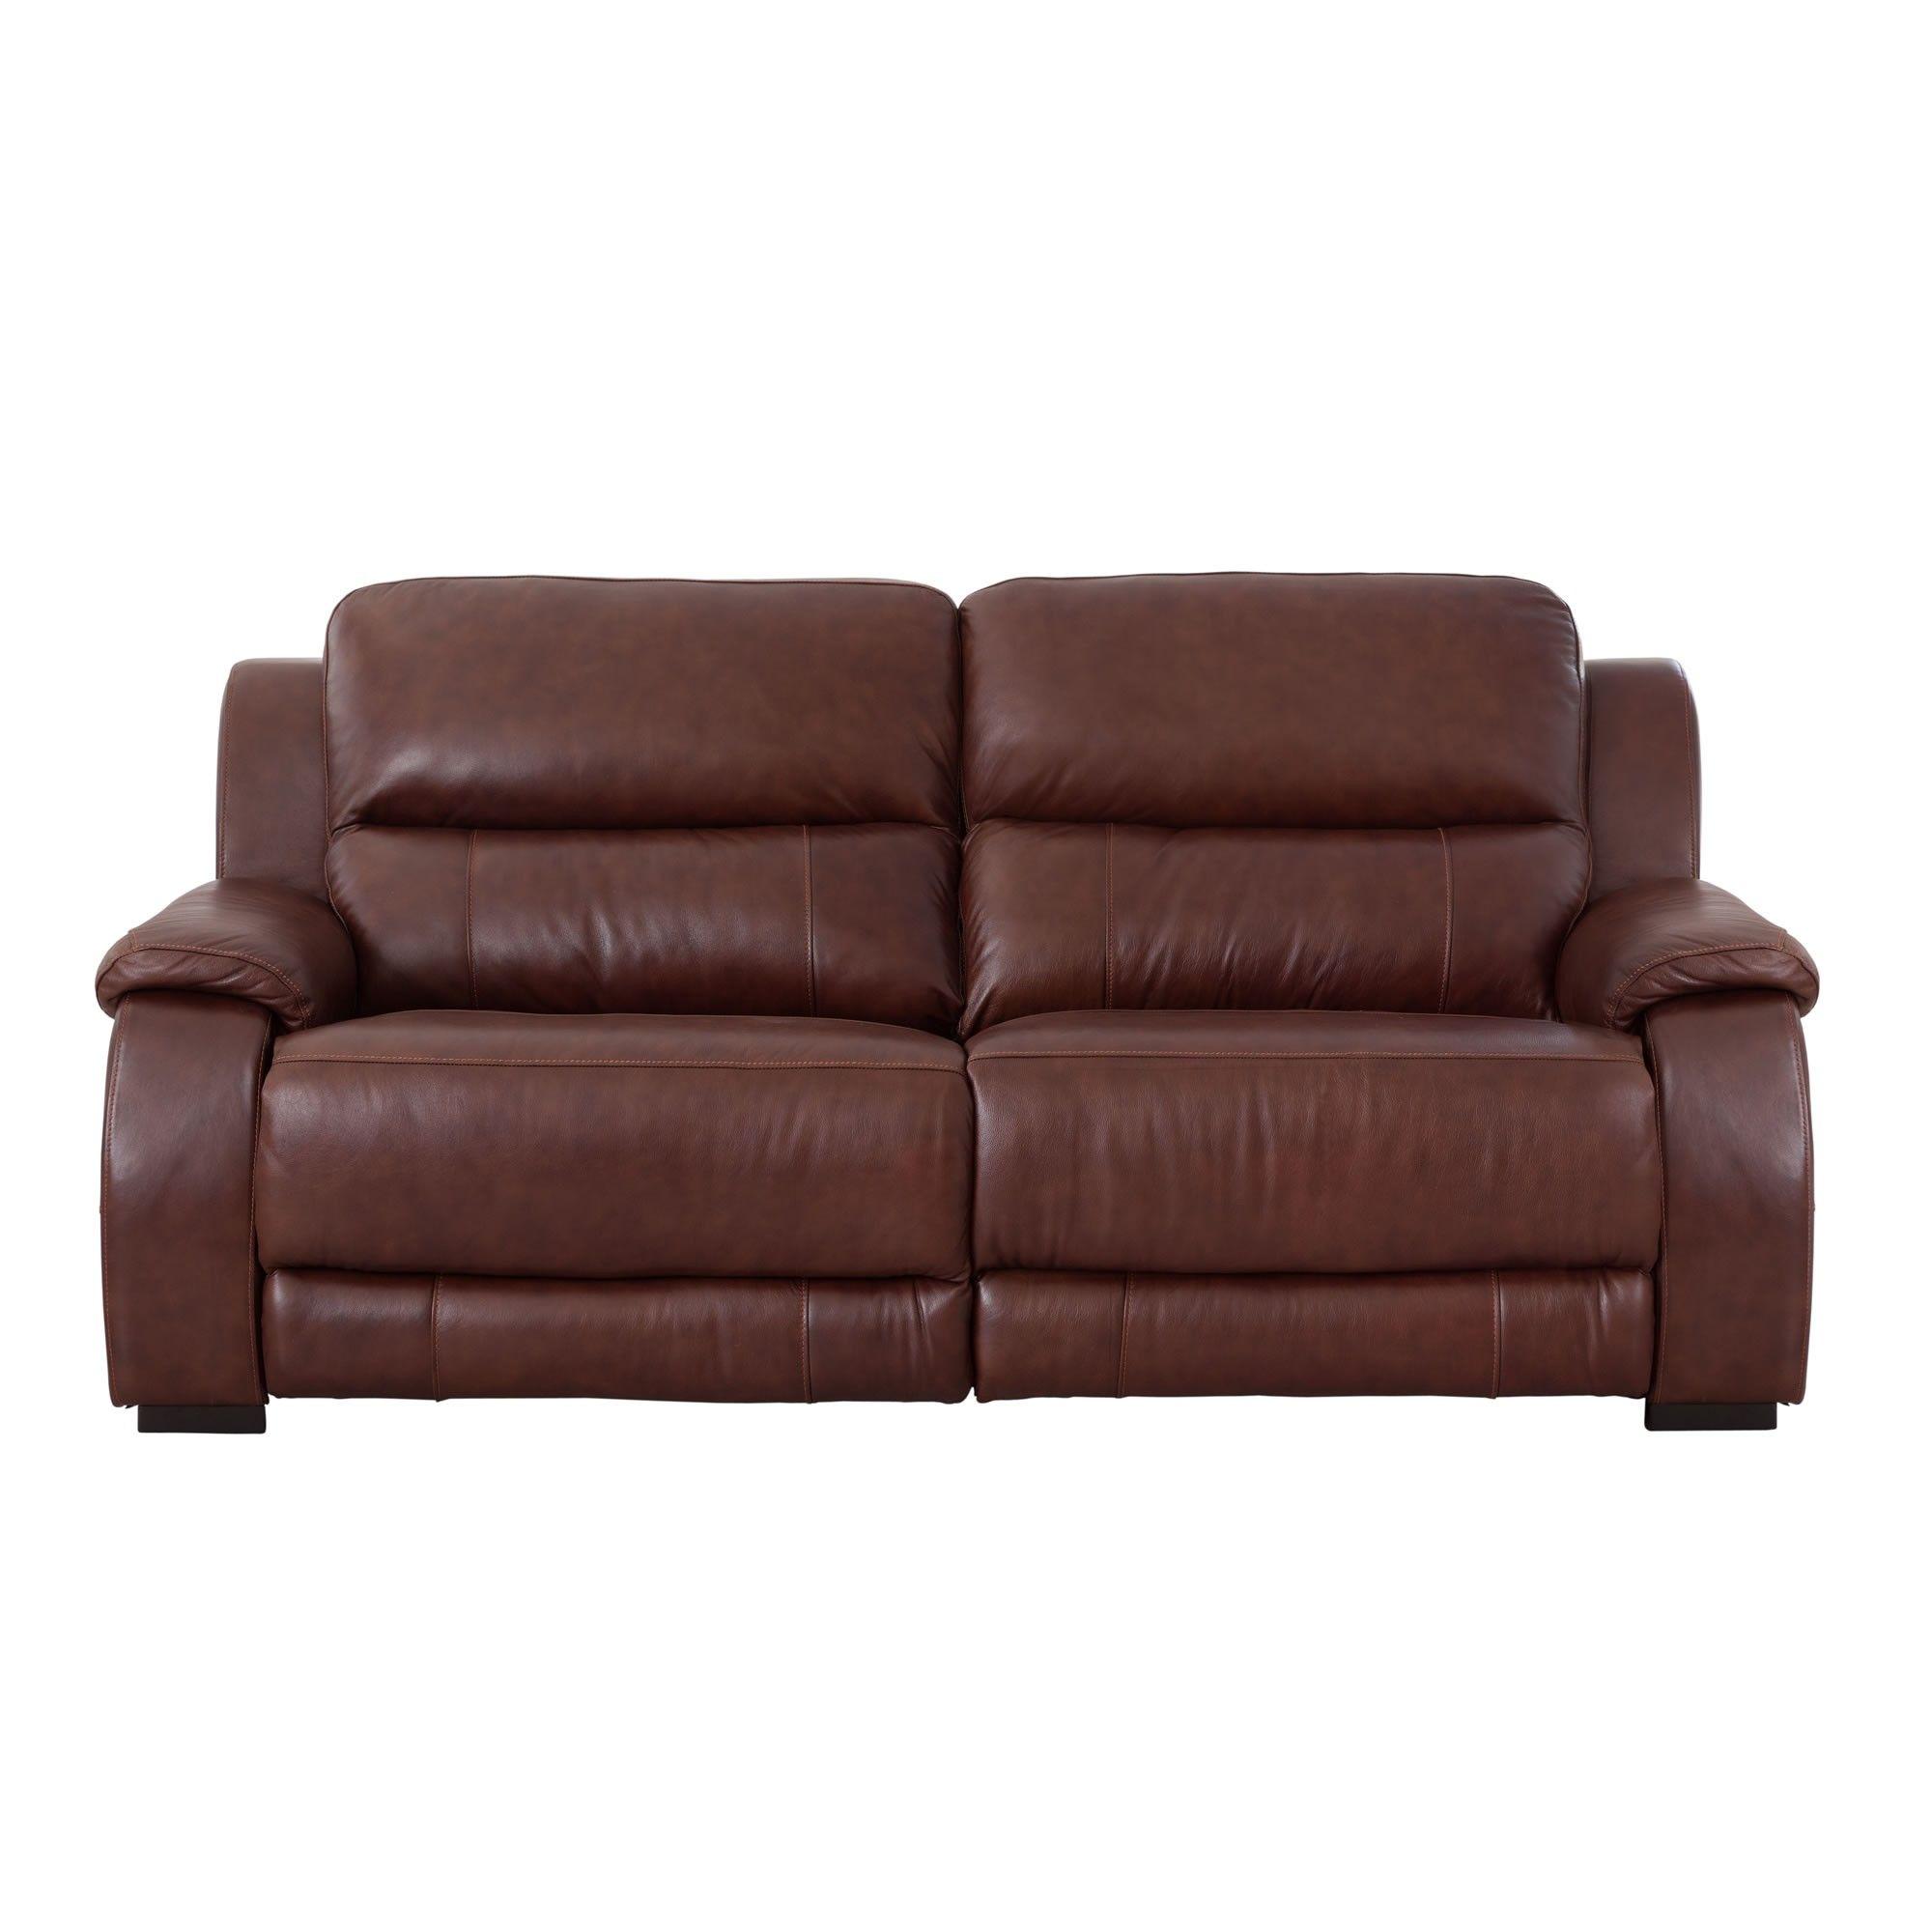 Como tapizar un sofa de polipiel stunning sof plazas mdelegant tapizado en polipiel x x cm with - Tapizar un sofa de piel ...